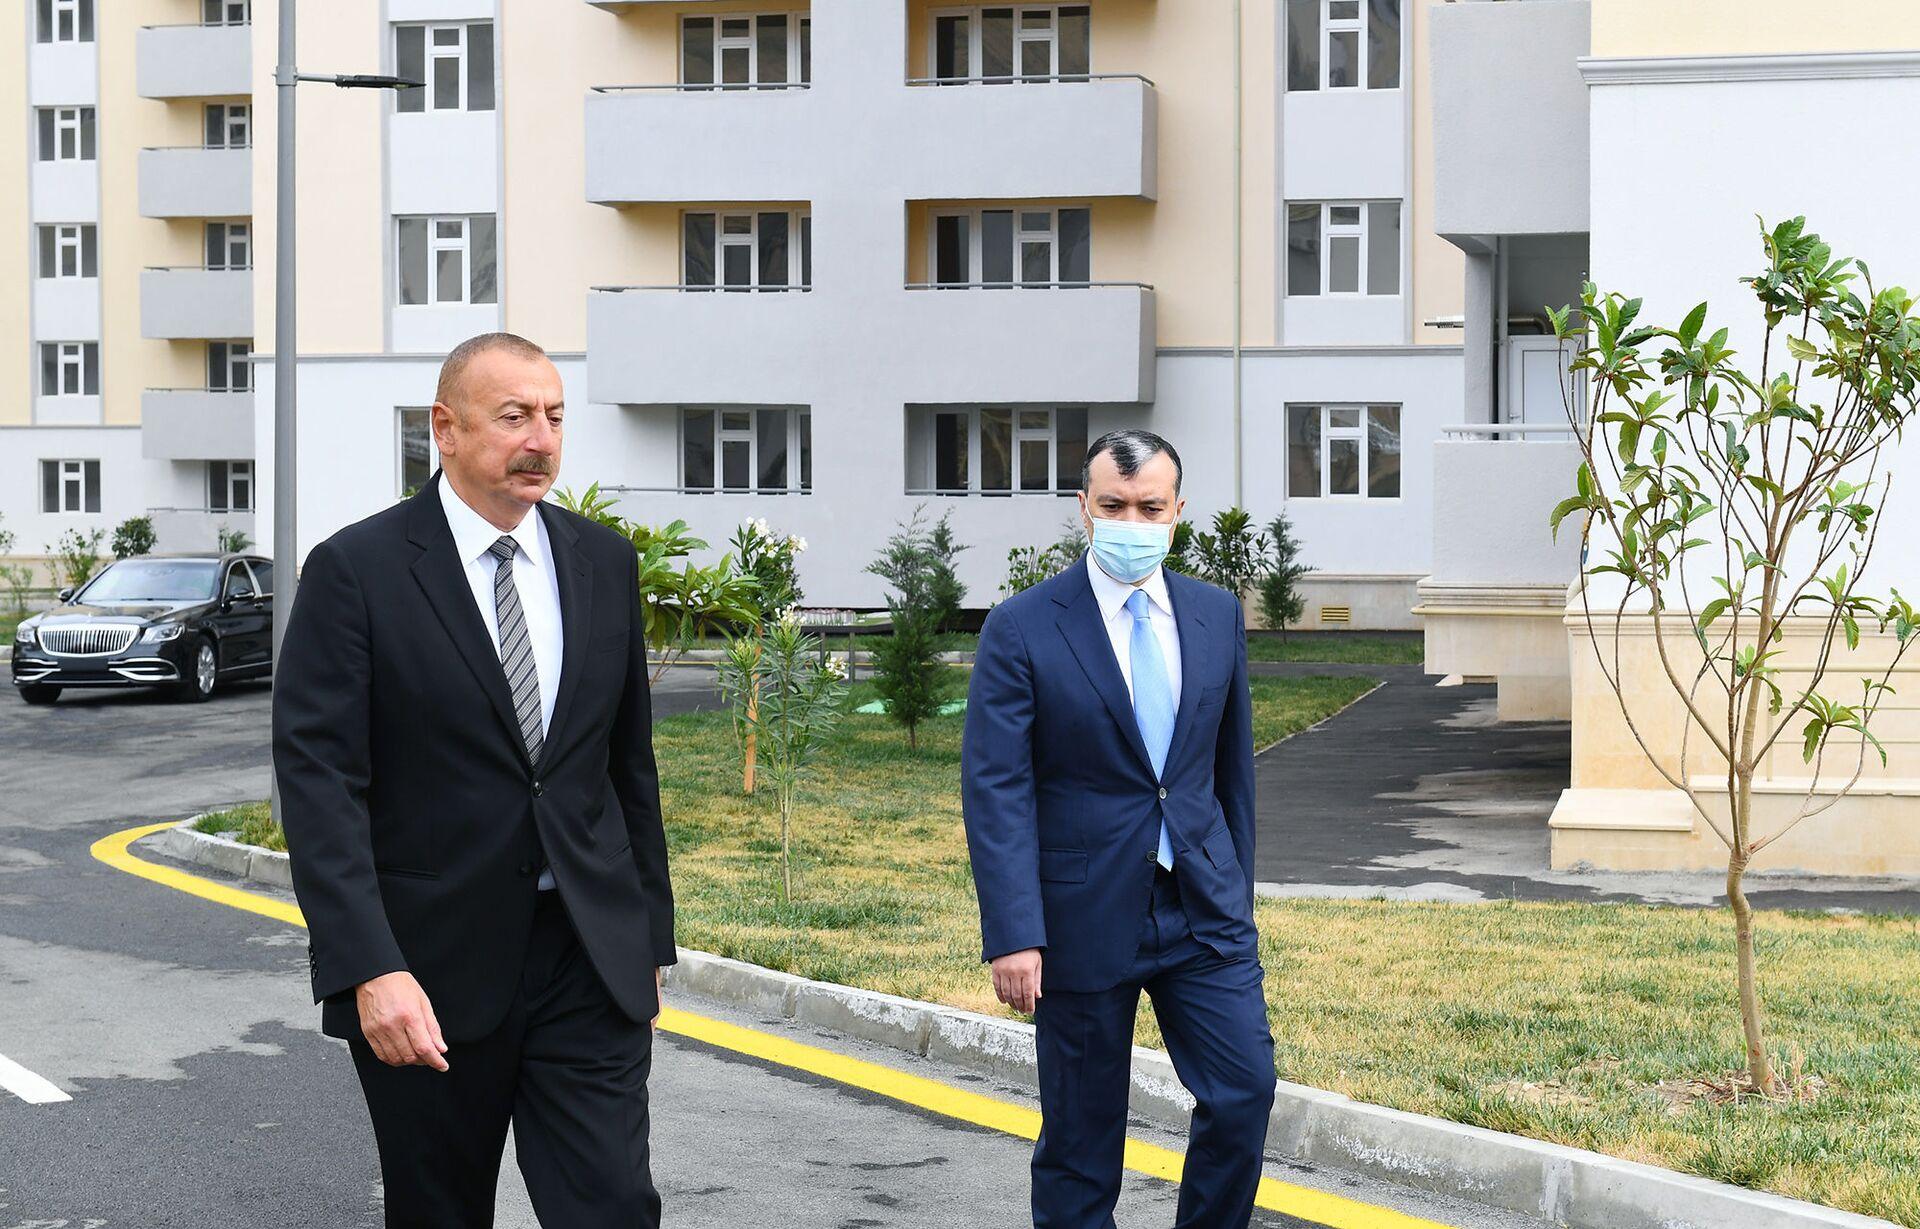 Президент Алиев назвал большую ошибку Армении - Sputnik Азербайджан, 1920, 14.07.2021